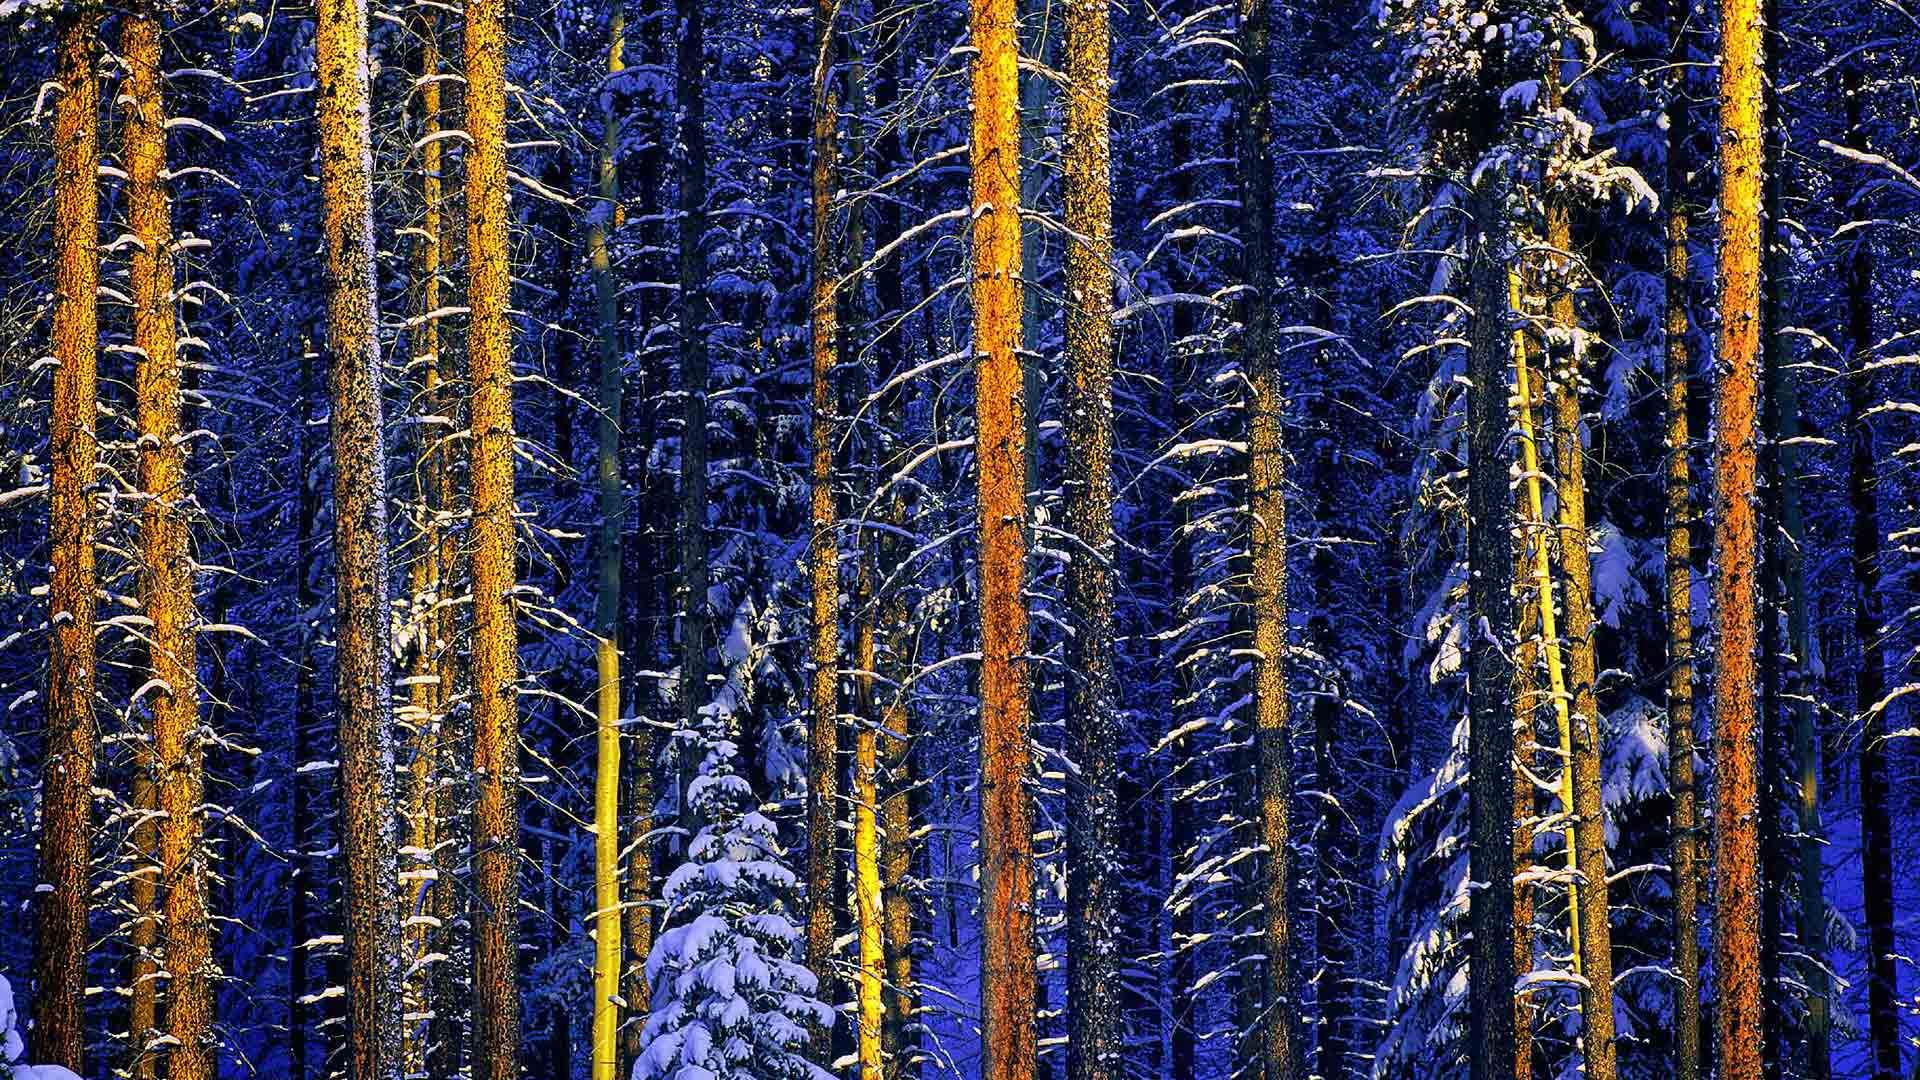 Jasper National Park, Alberta, Canada (© Daryl Benson/Masterfile/Corbis)